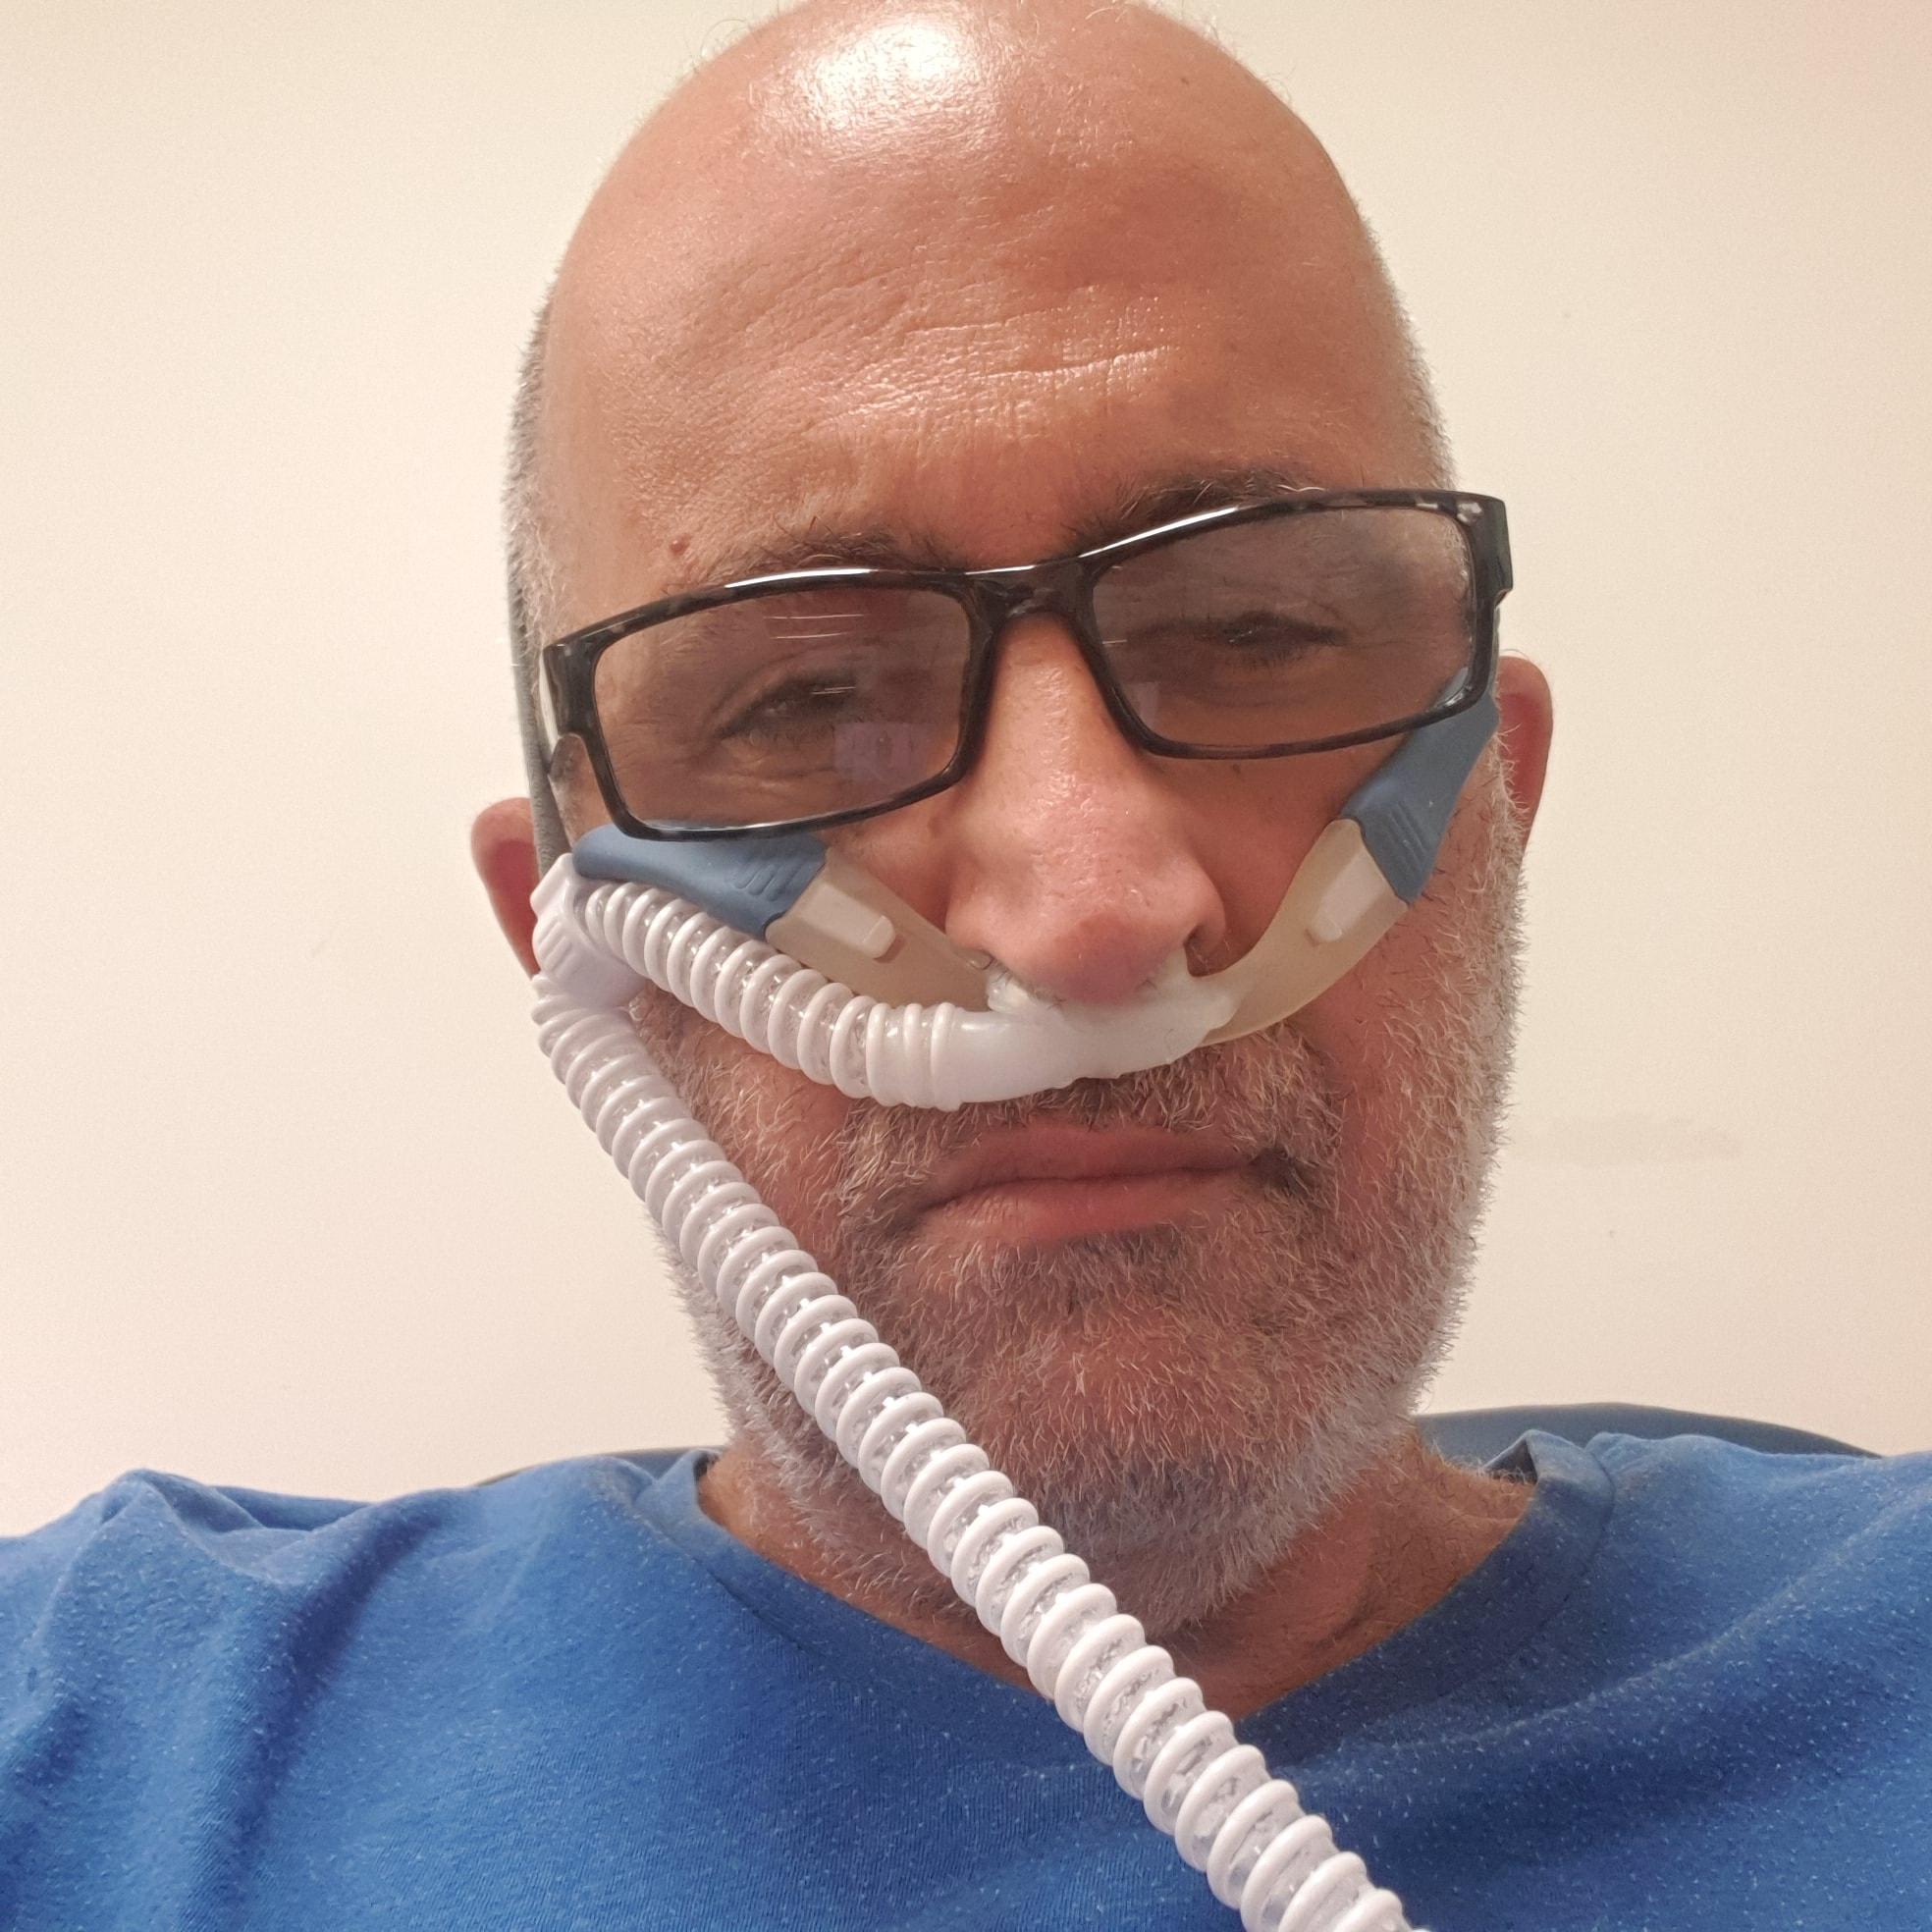 Hai Shaulian trong lúc điều trị tại Trung tâm Y tế Wolfson ở thành phố Holon, quận Tel Aviv, Israel. Ảnh: Facebook/Hai Shaulian.